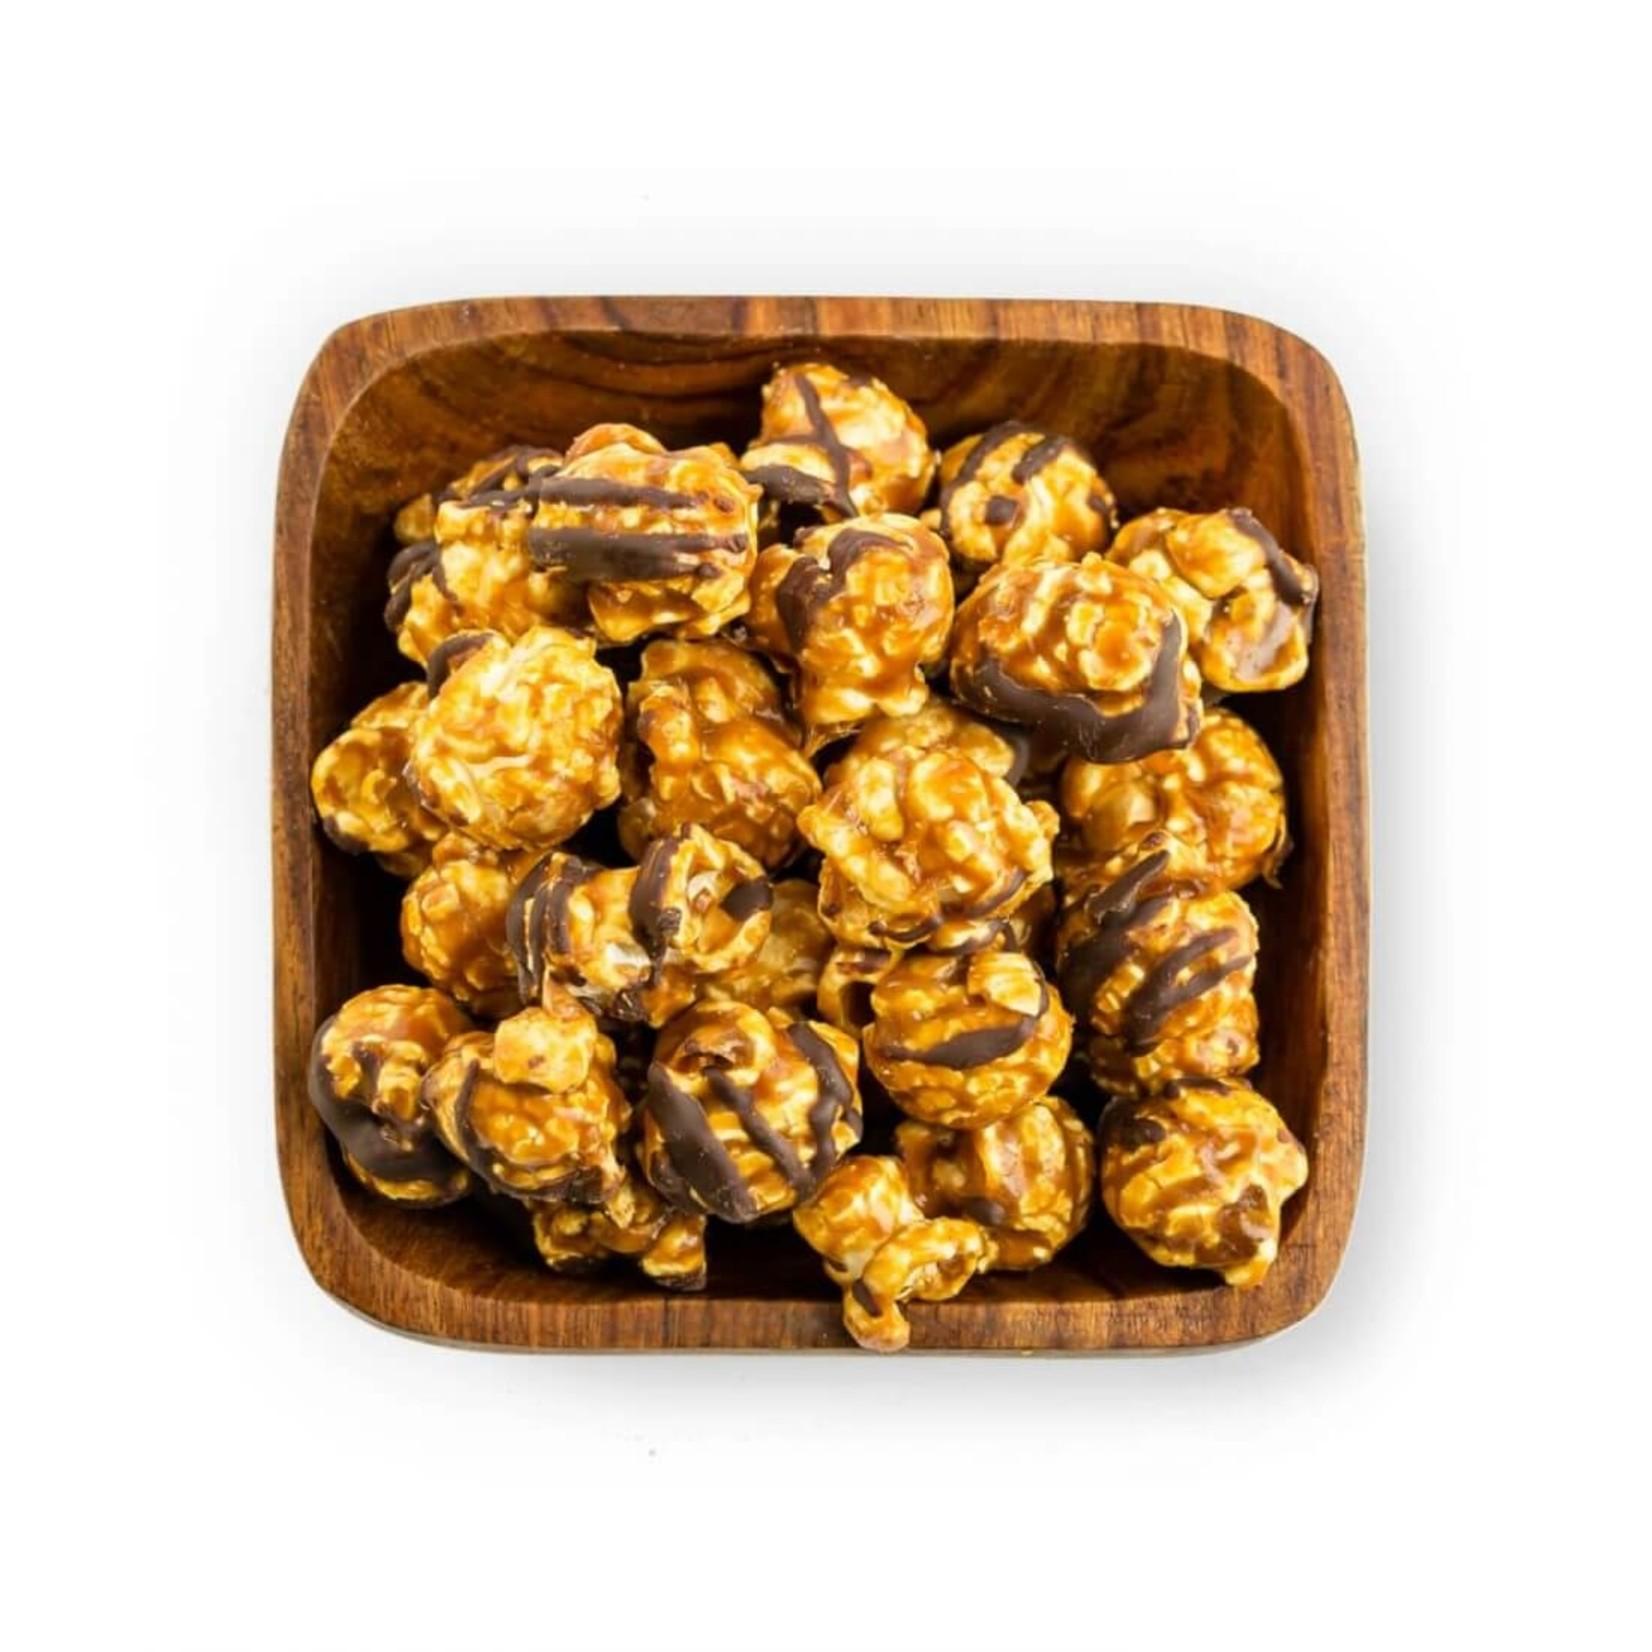 Popinsanity Caramel Chocolate Drizzle Artisanal Popcorn